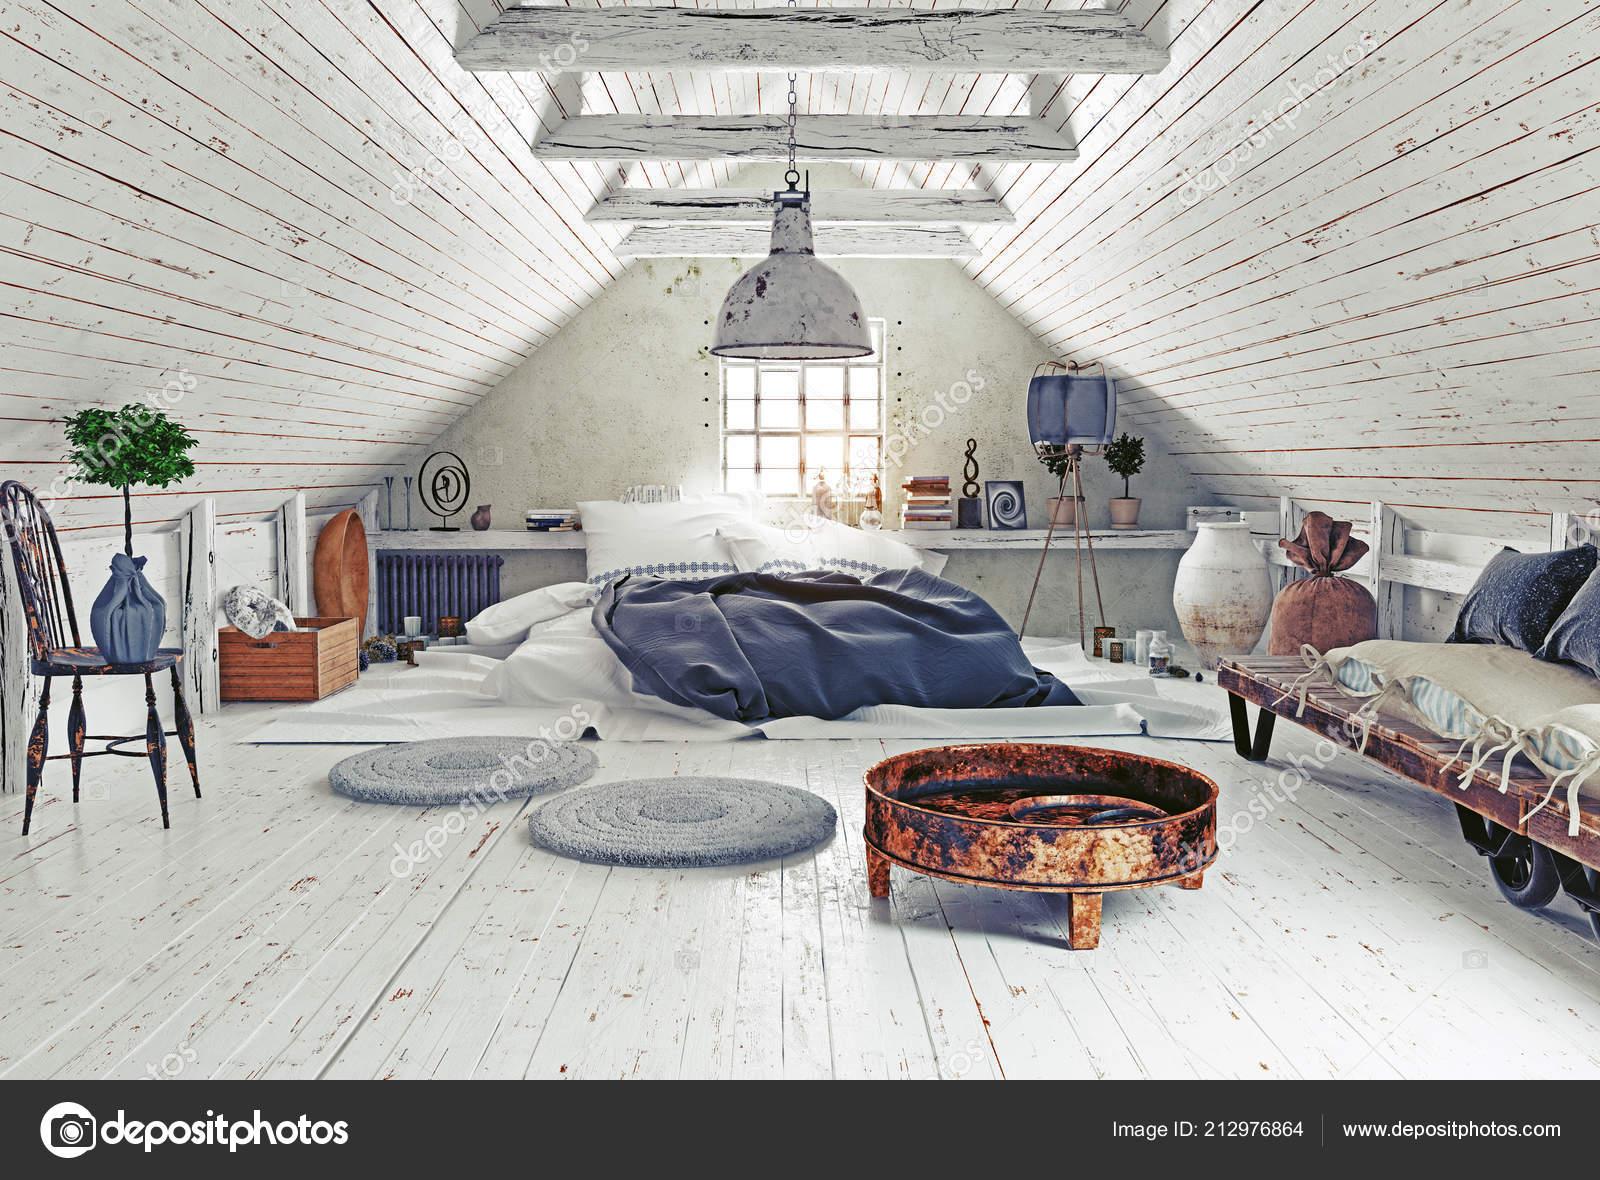 Modern Attic Bedroom Design White Walls Rendering Interior Stock Photo Image By C Vicnt2815 212976864